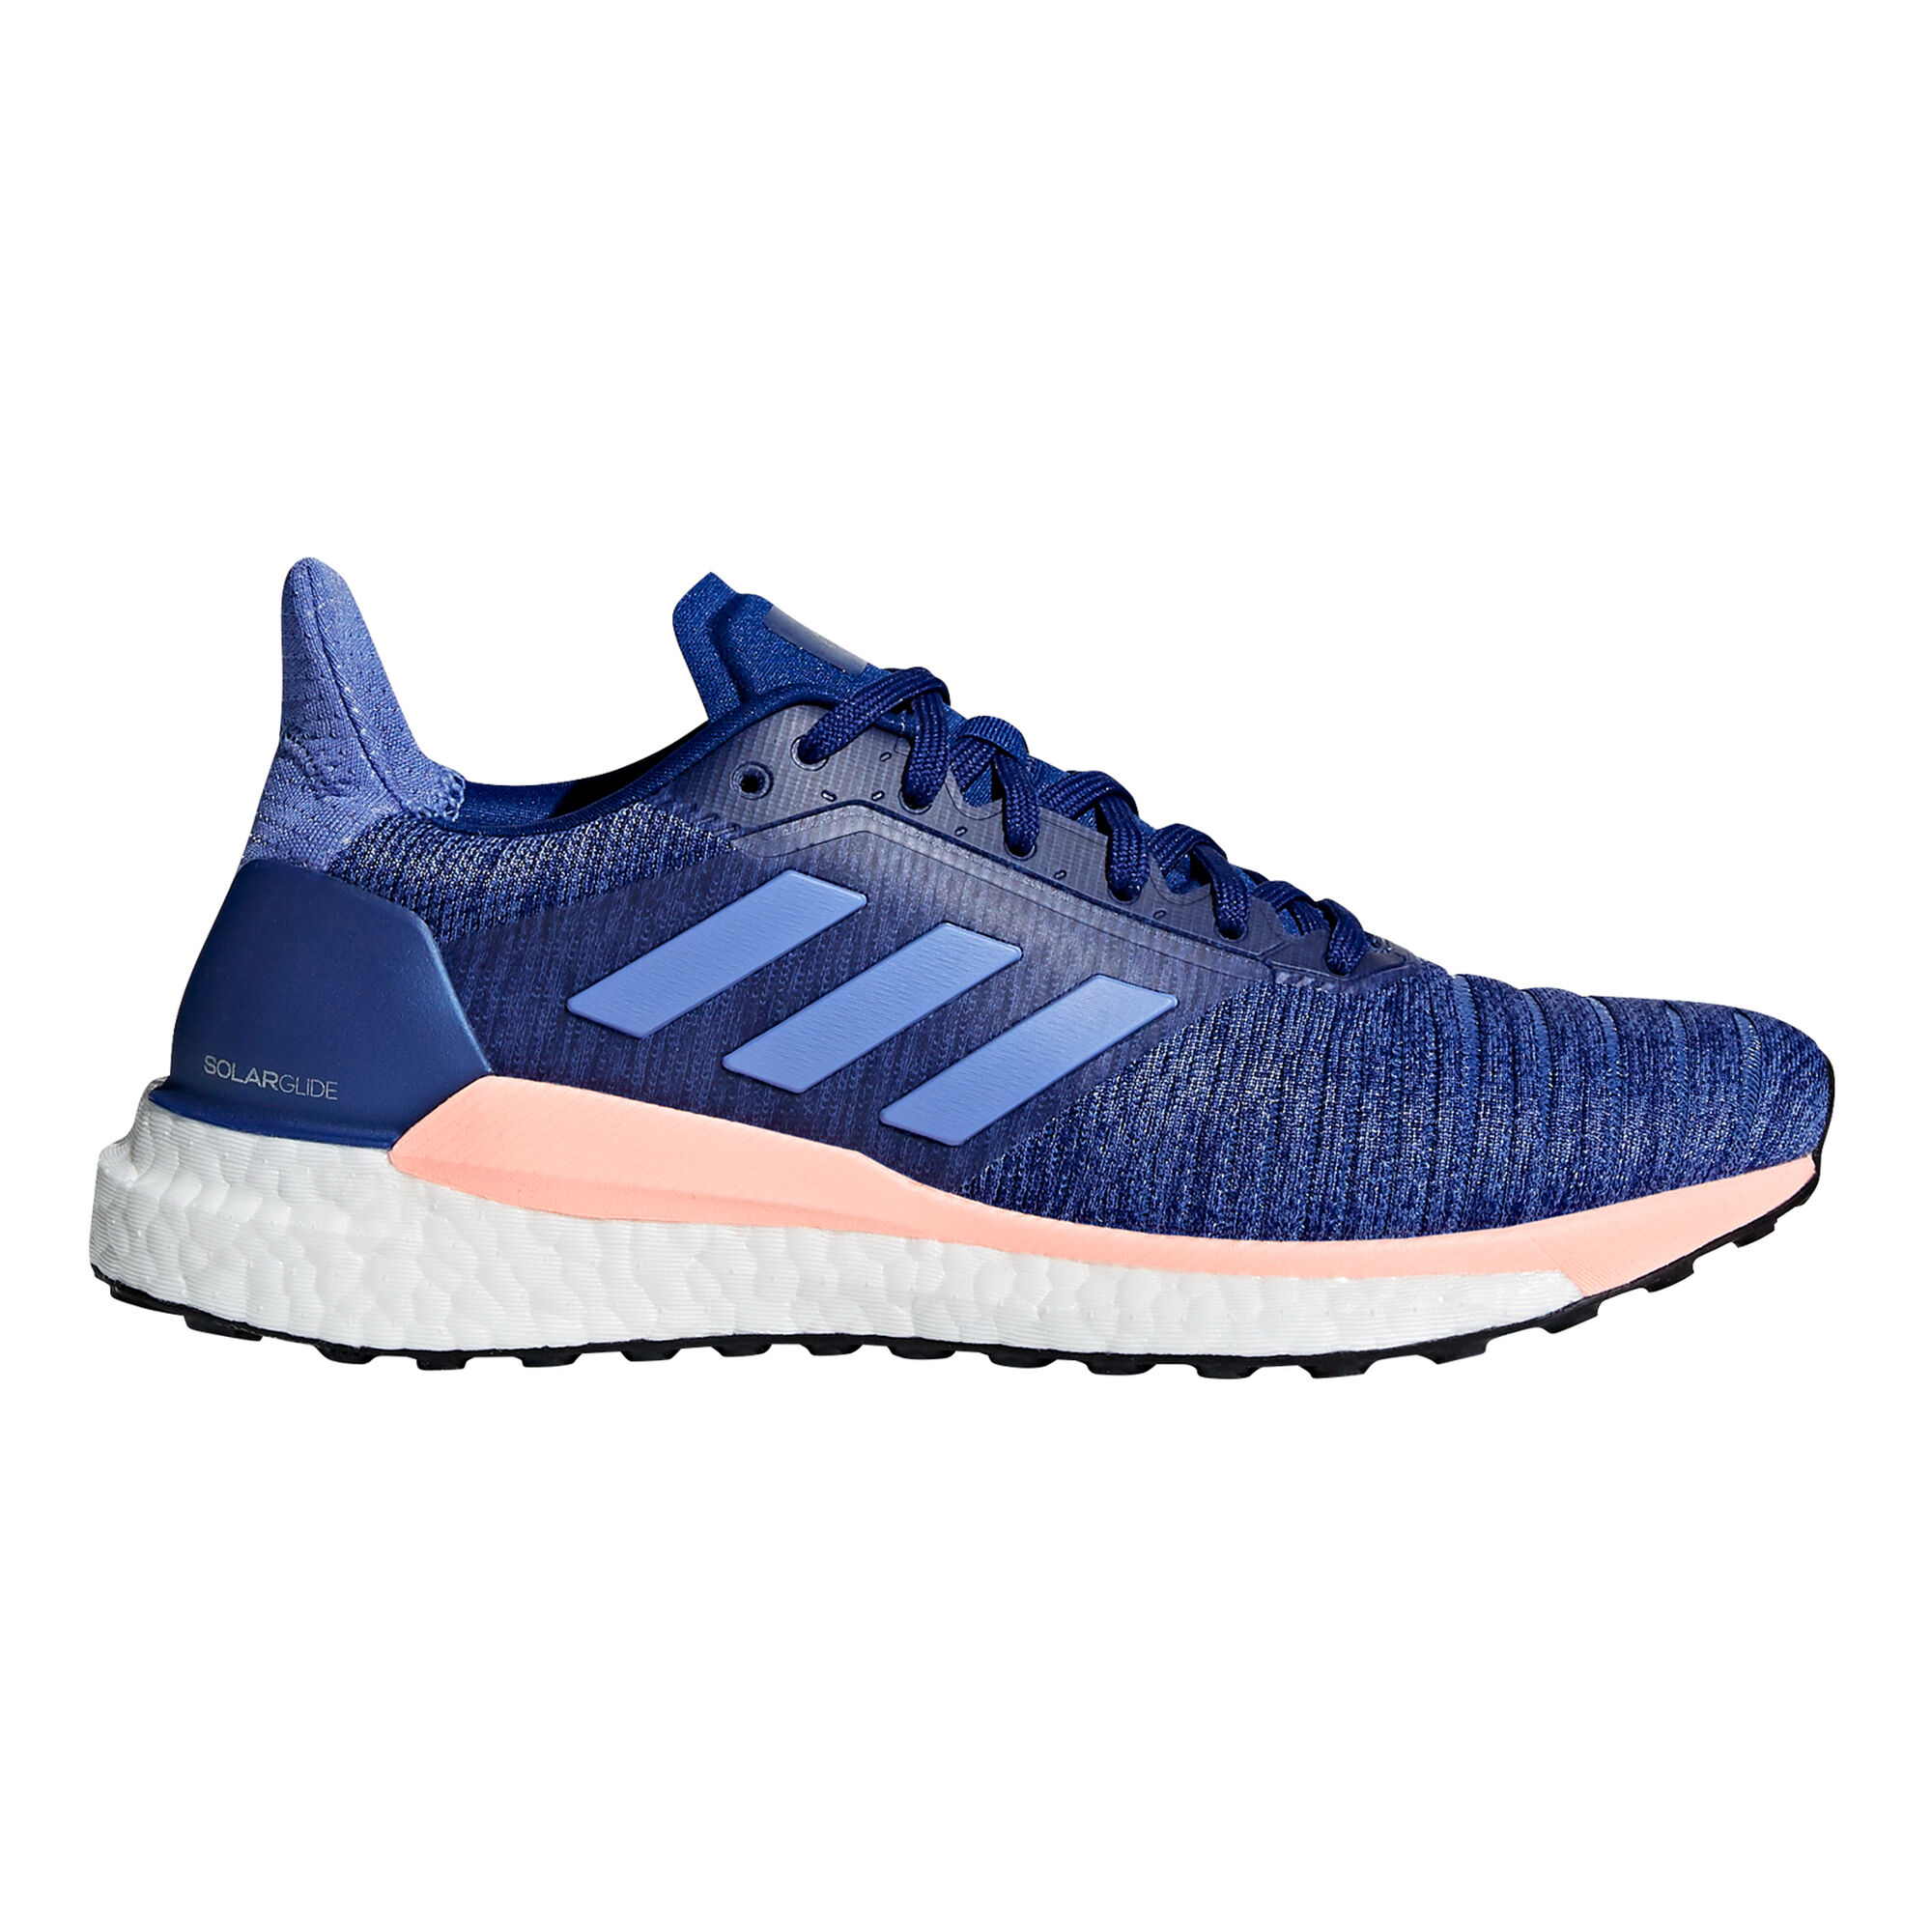 5740cc6e84c300 buy adidas Solar Glide Neutral Running Shoe Women - Blue